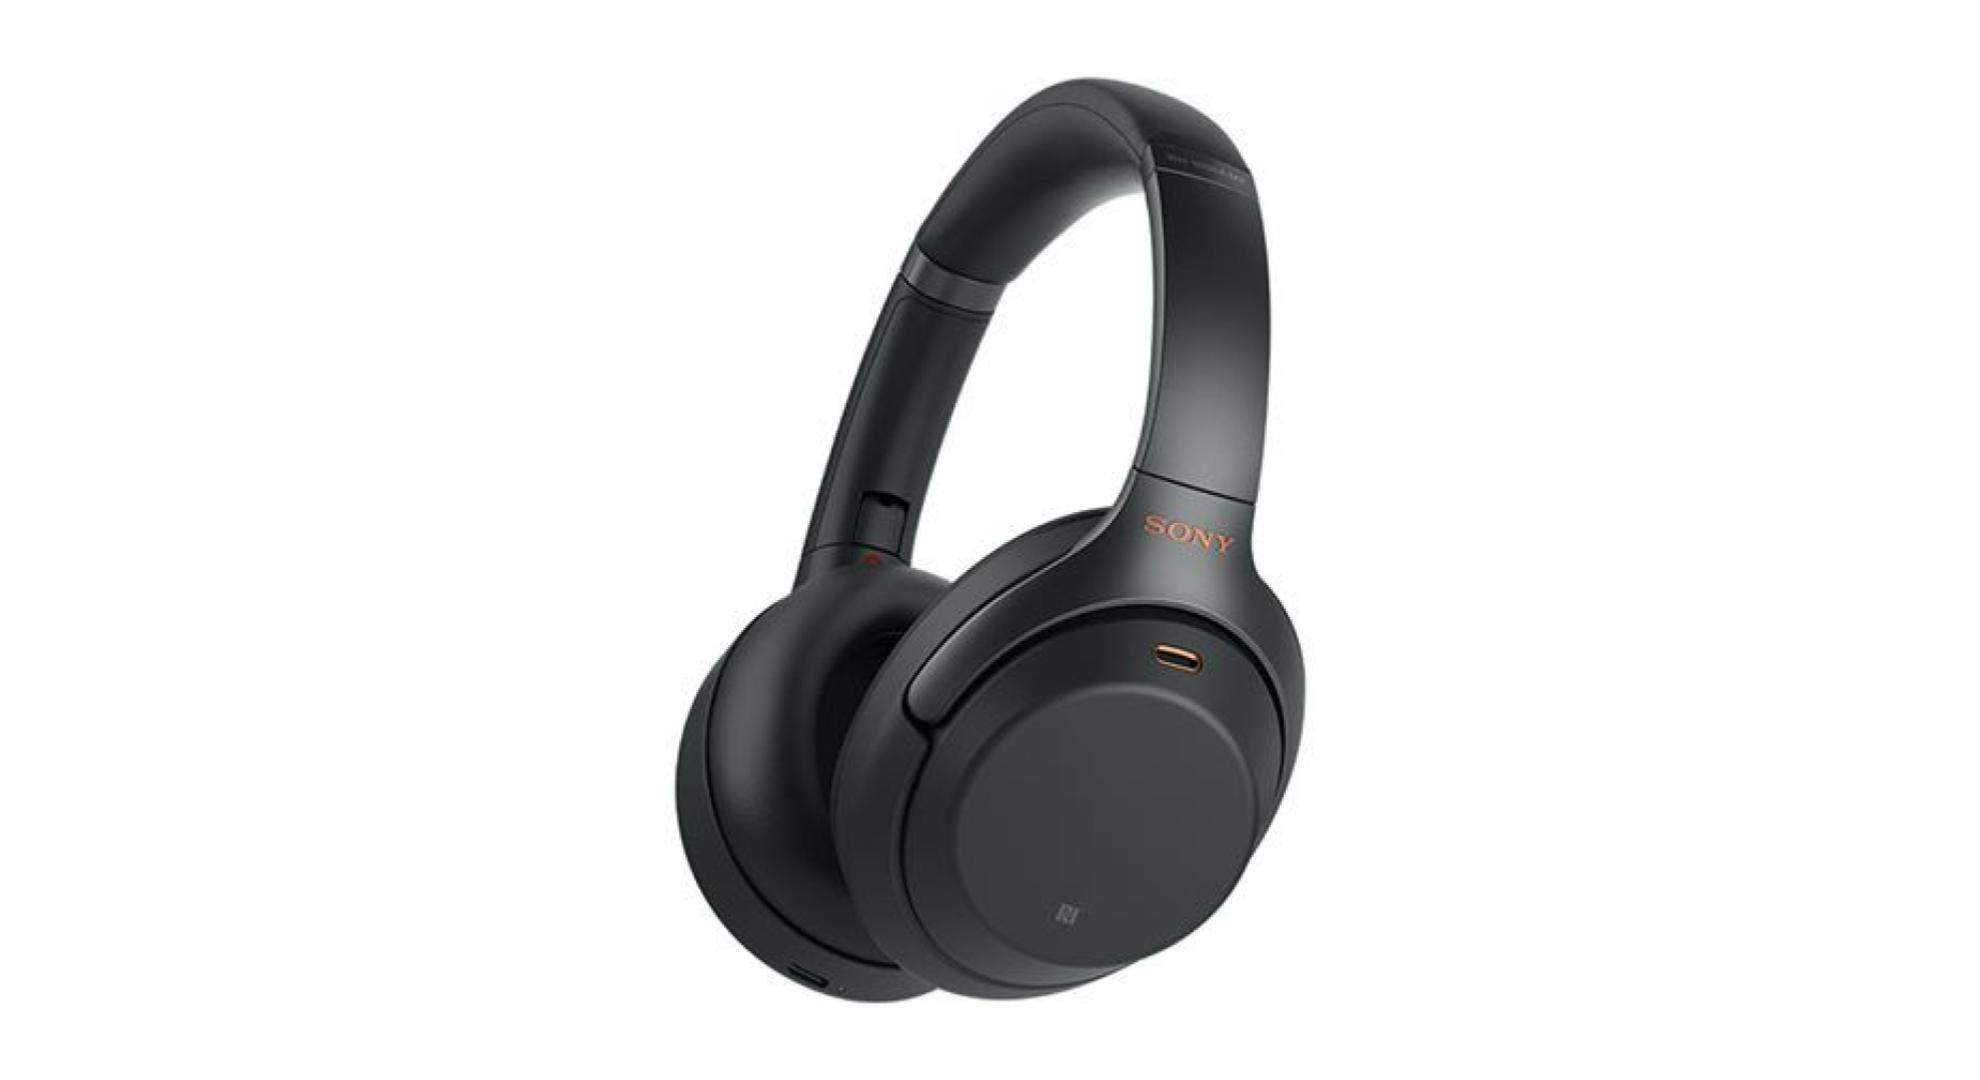 casque audio sony avec assistant vocal